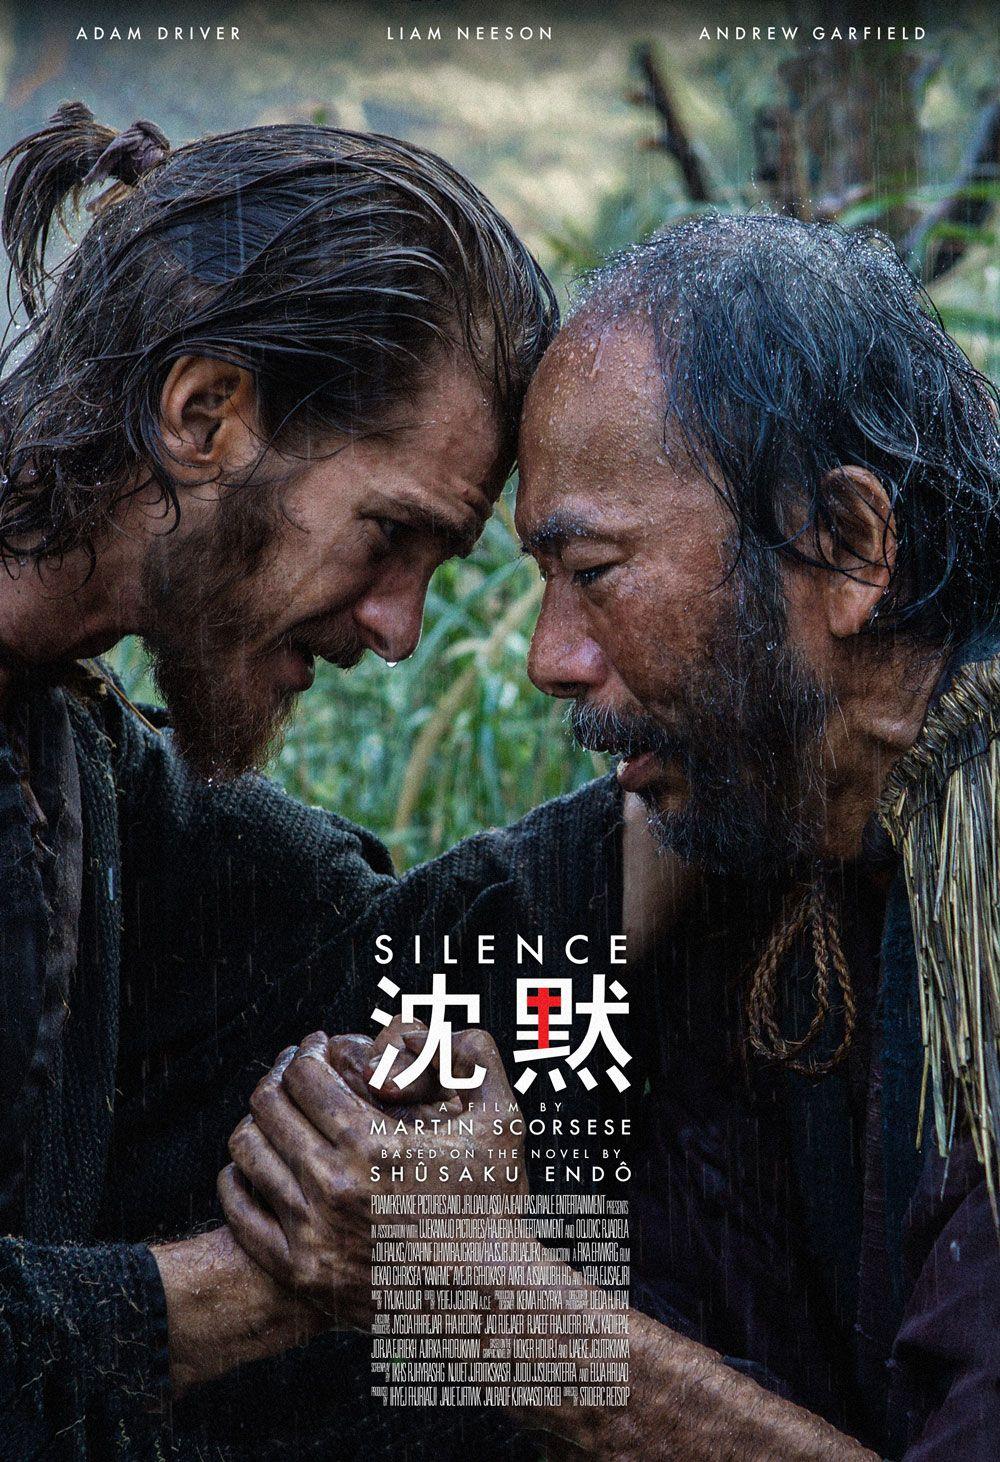 silence (2016) - new martin scorsese film hd wallpaper from